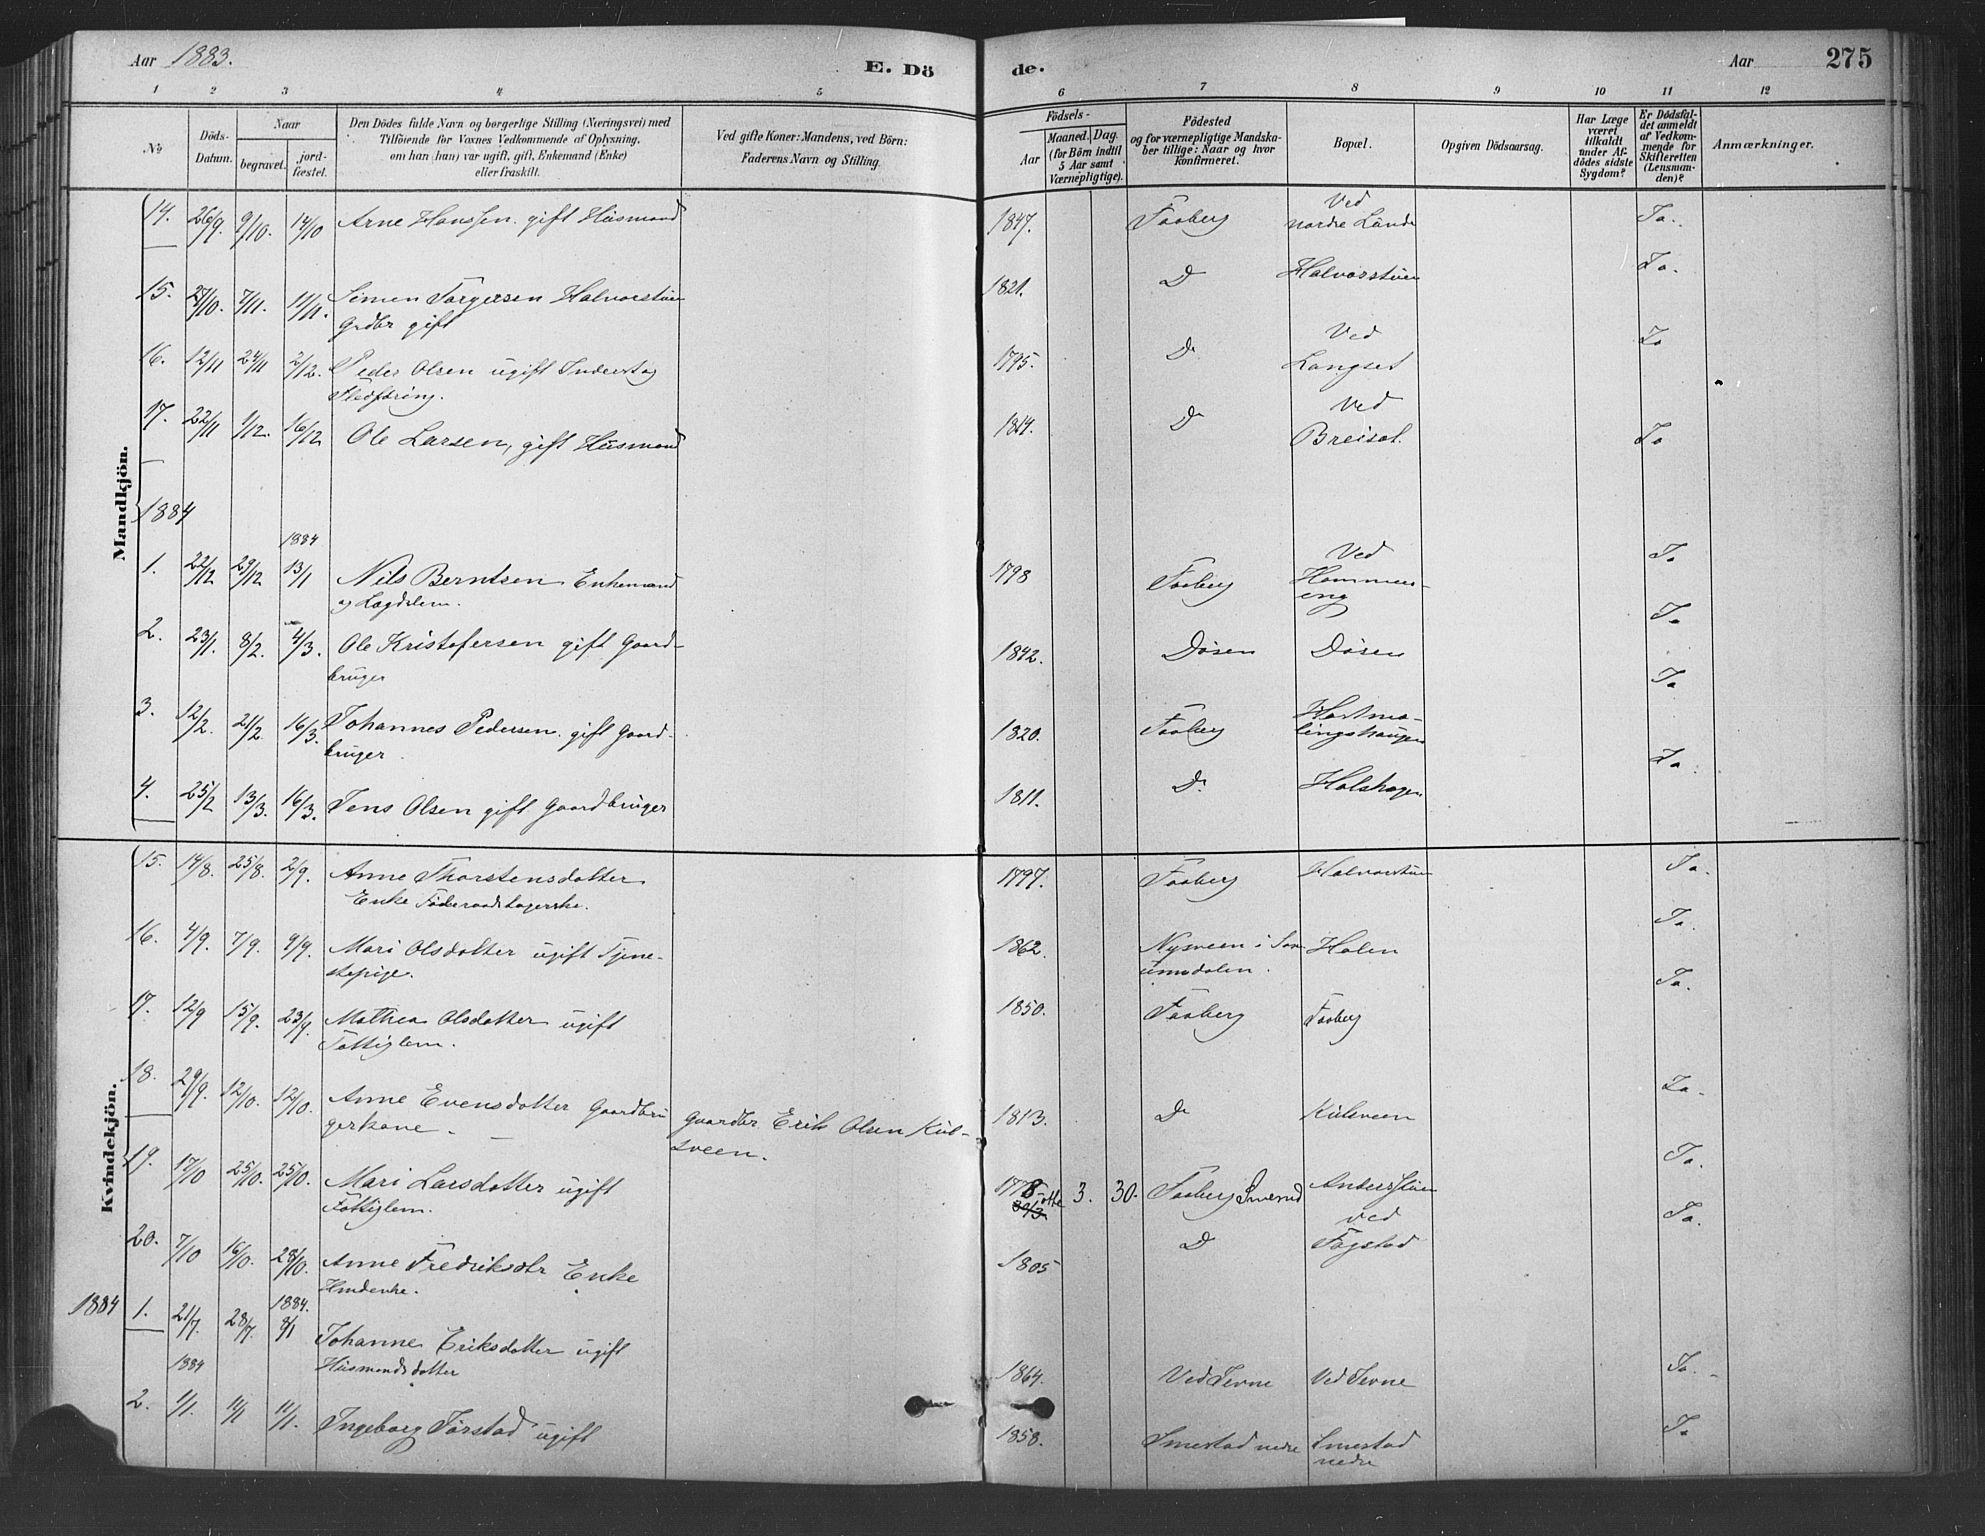 SAH, Fåberg prestekontor, Ministerialbok nr. 9, 1879-1898, s. 275